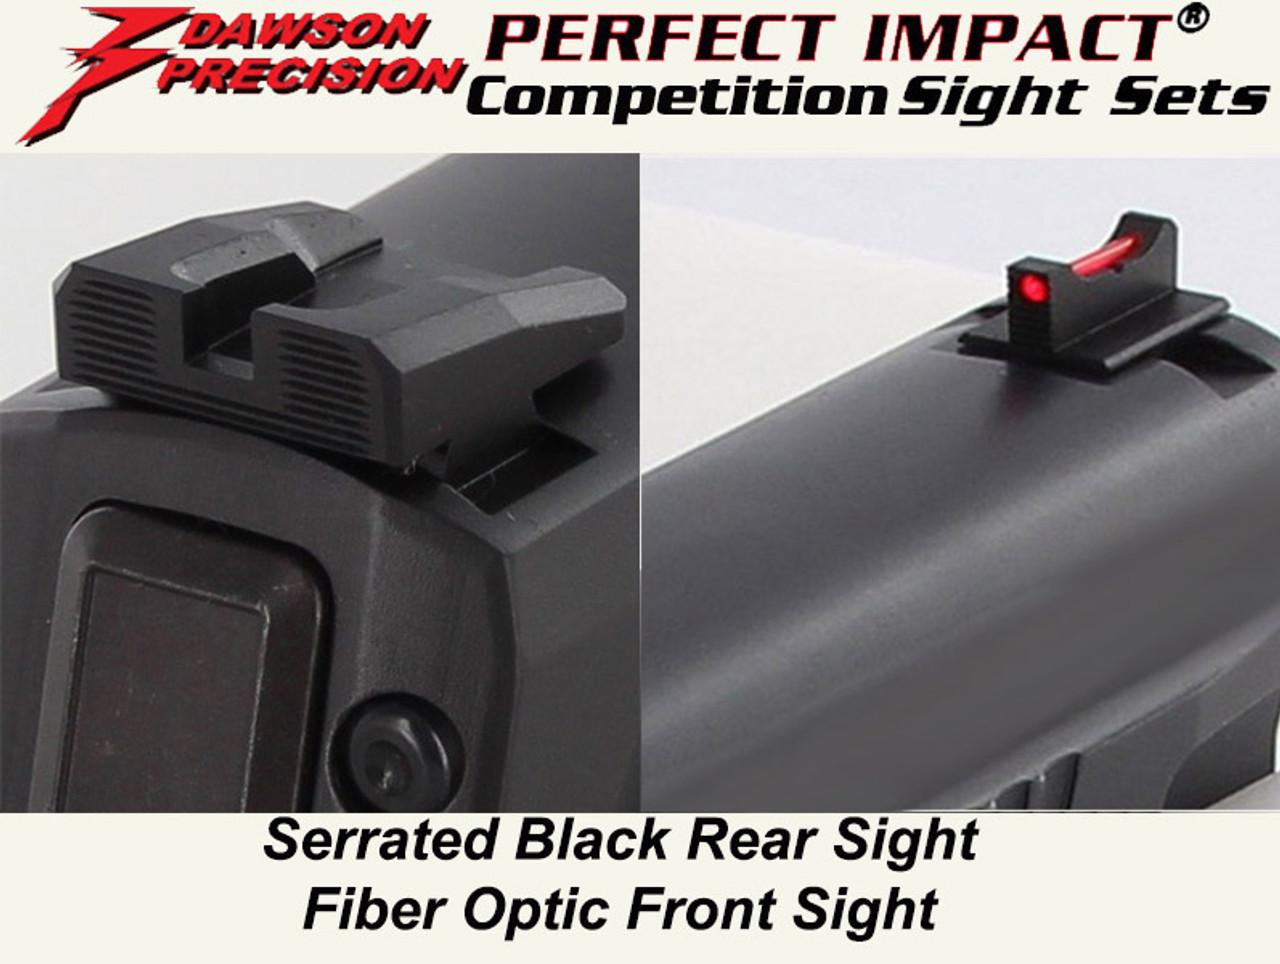 #1 Seller Dawson Precision Sig P320 Competition Fixed Sight Set - Black  Rear & Fiber Optic Front